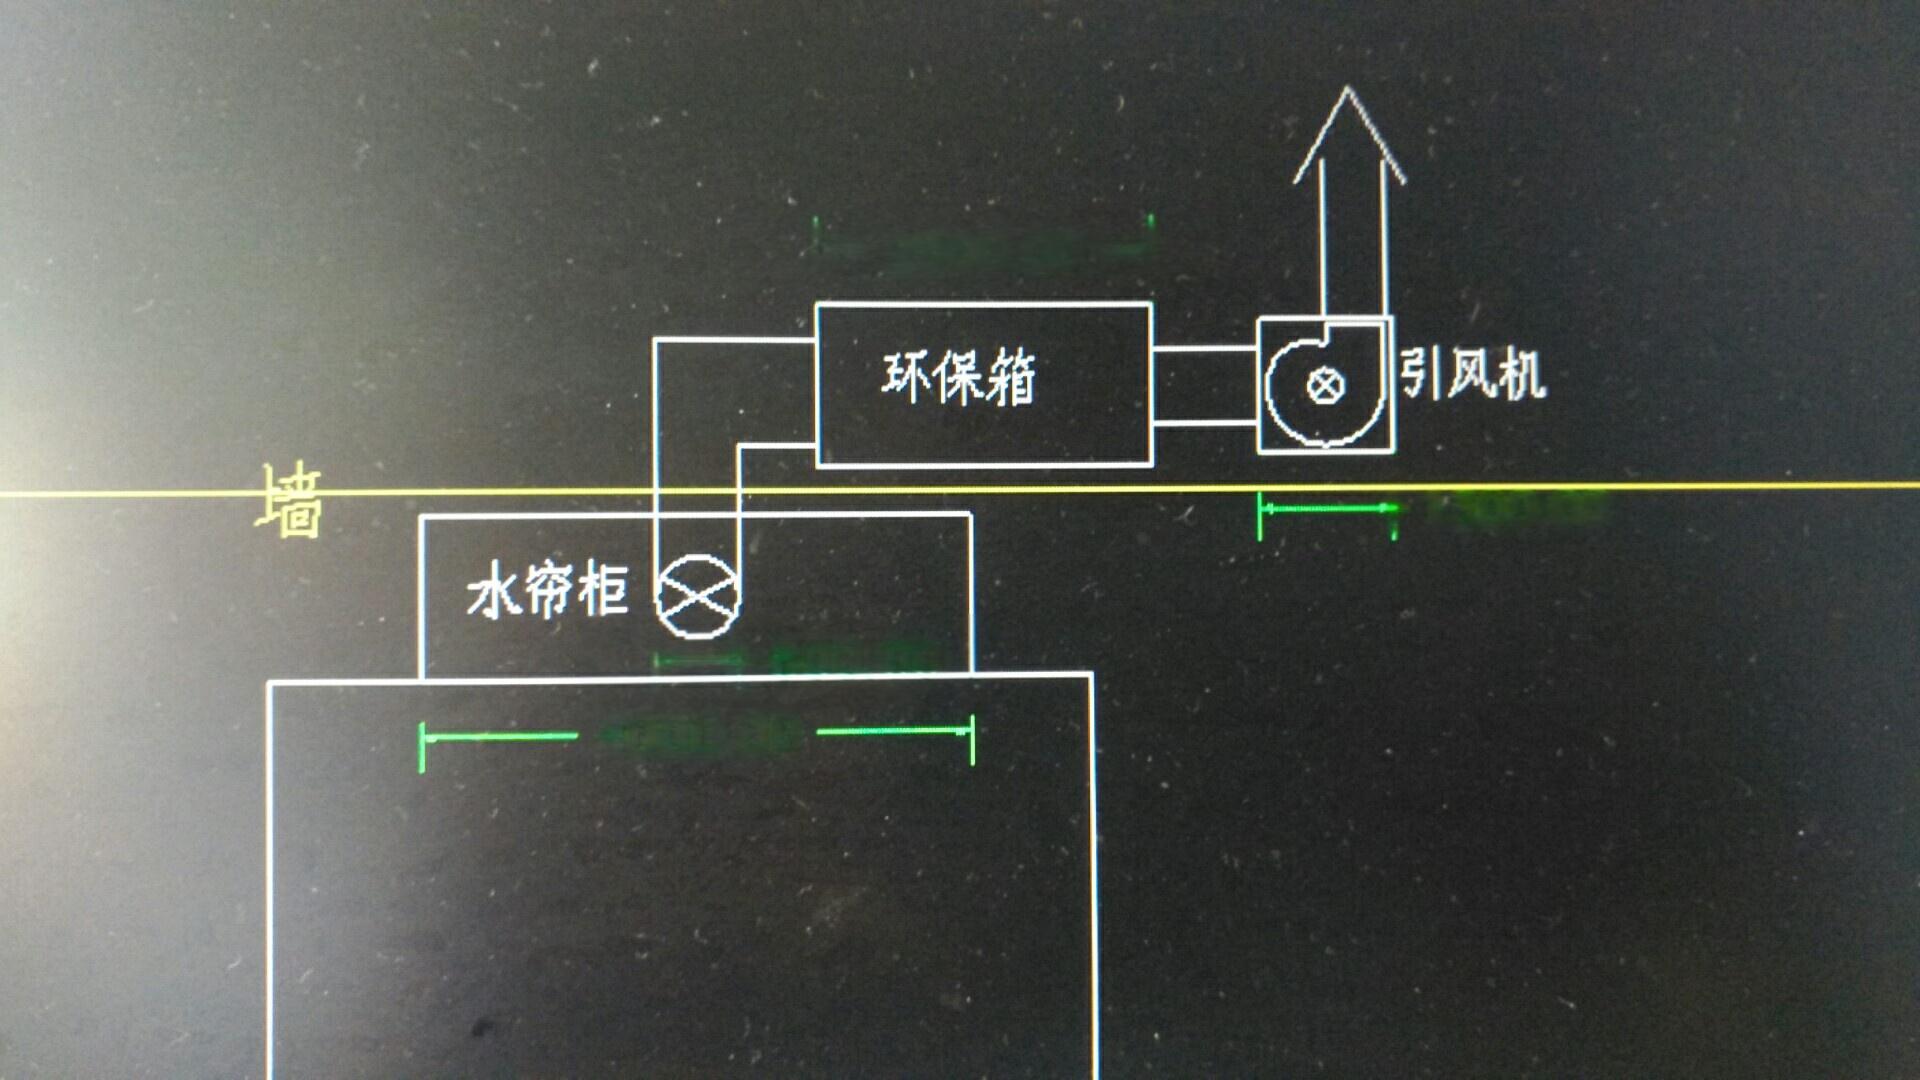 wx_camera_1530180267354.jpg